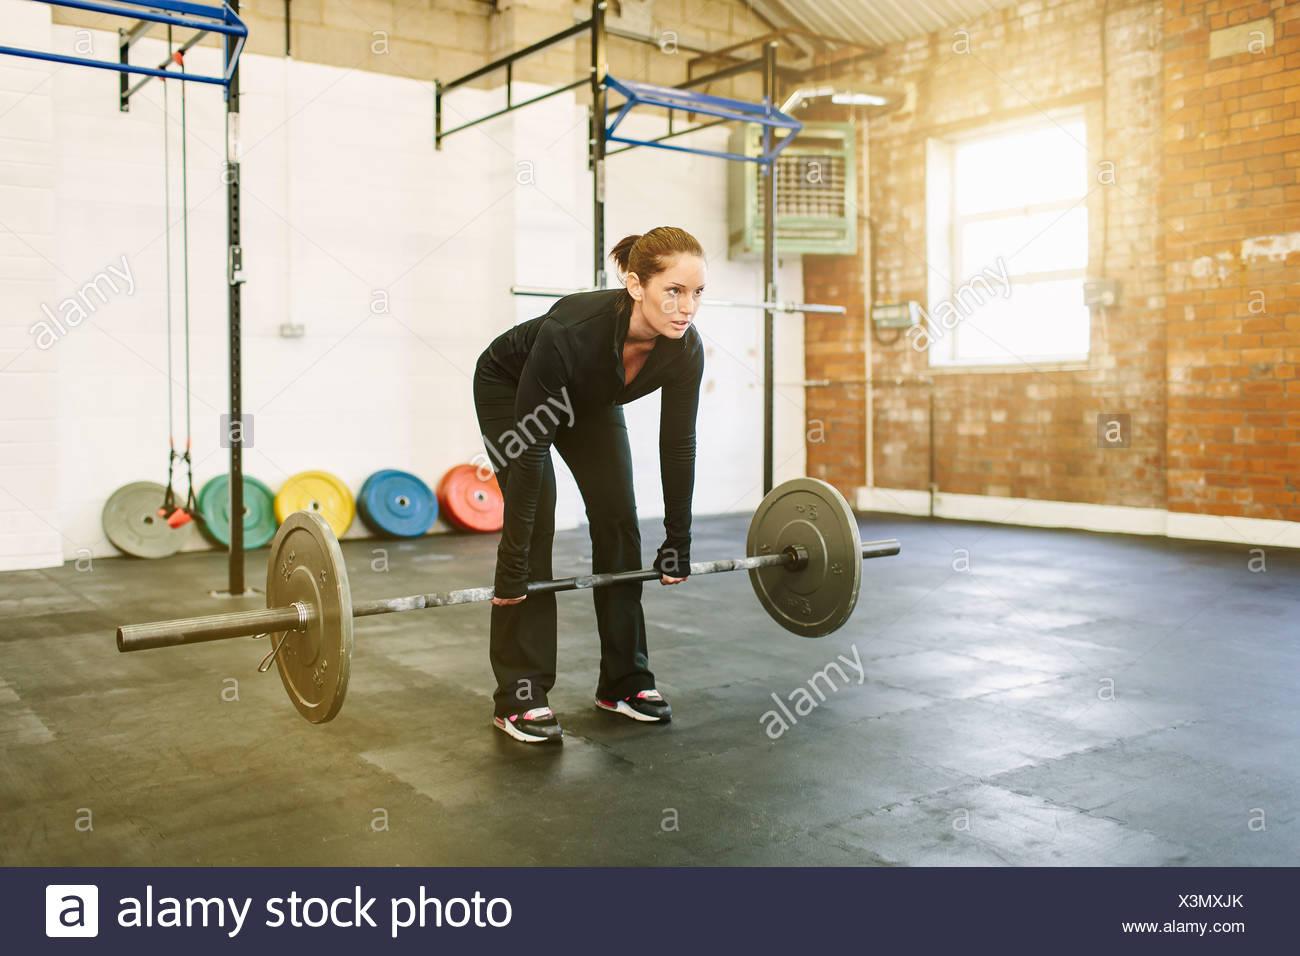 Mujer levantamiento barbell en gimnasio Imagen De Stock